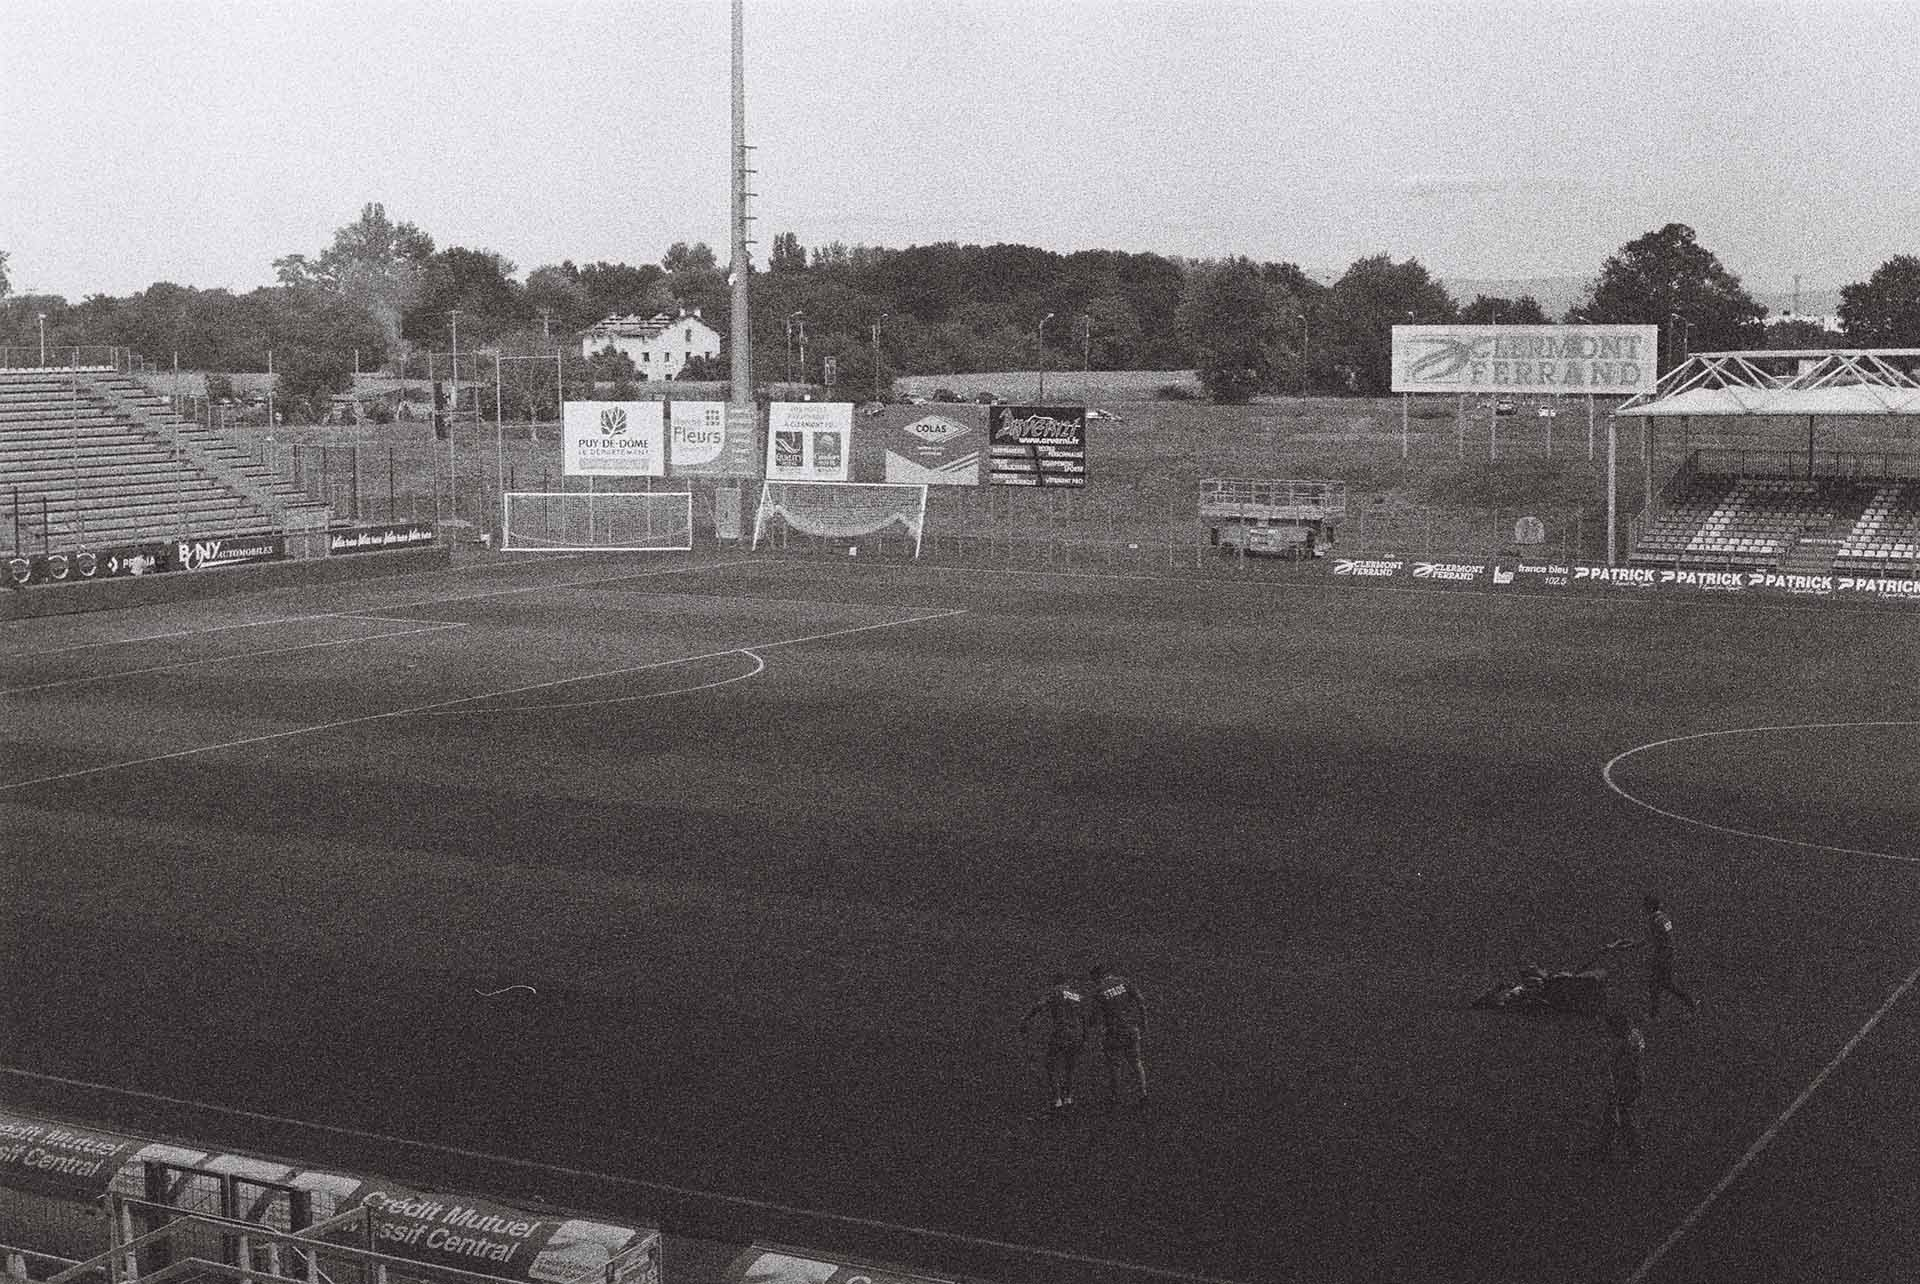 Stade du Clermont Foot